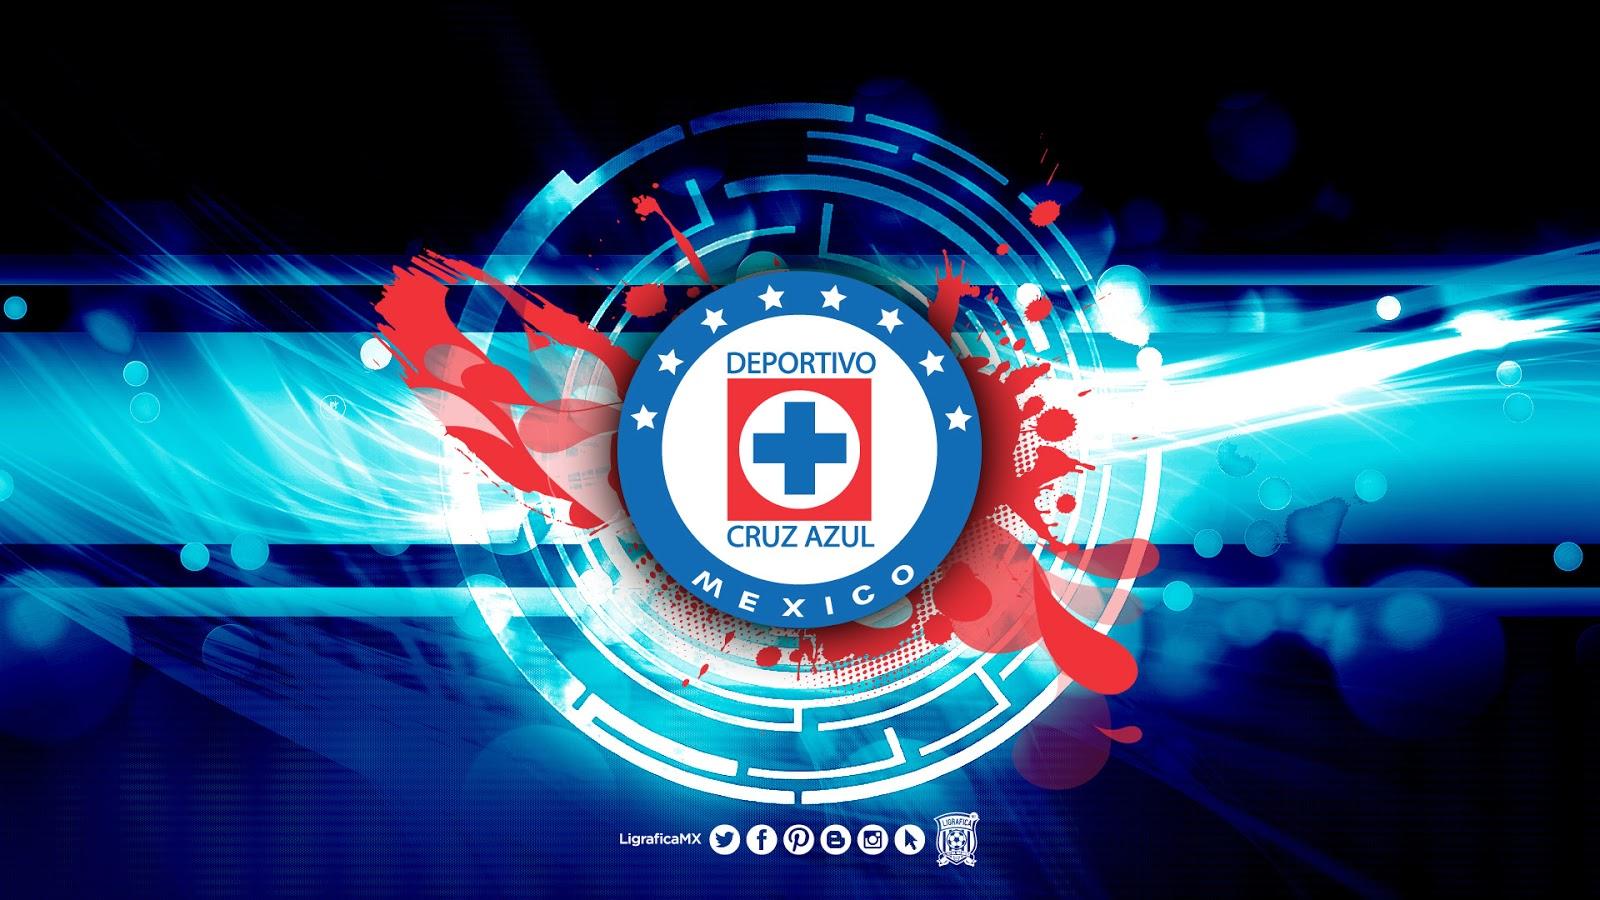 Club America Wallpapers 3d Ligrafica Mx Liga Bancomer Mx 030314ctg